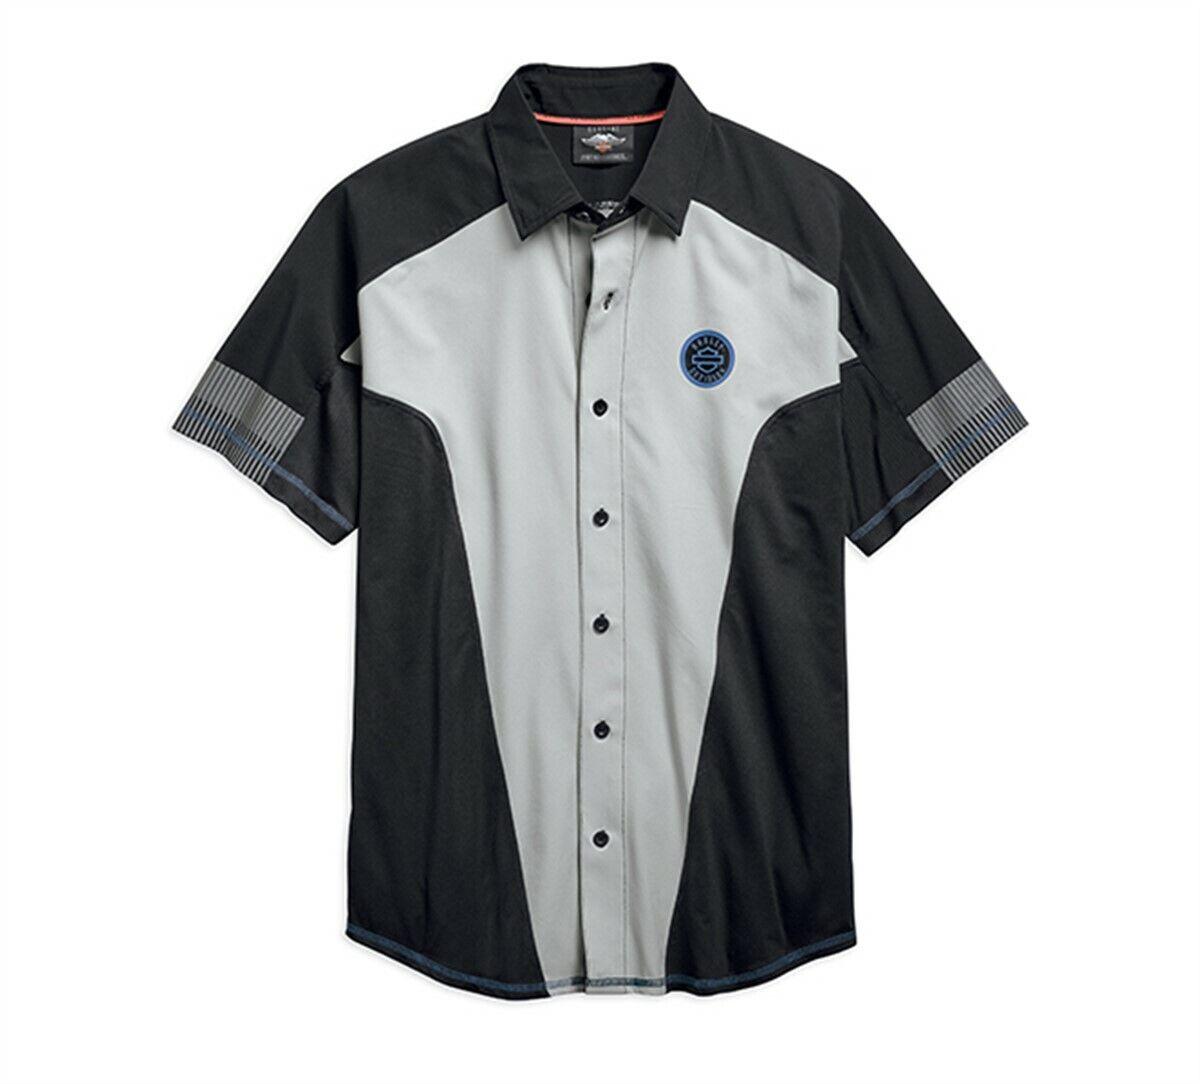 8dbc5af98b HARLEY-DAVIDSON MEN S PERFORMANCE GREY SHORT SHIRT 96657-19VM XL SLEEVE  MESH nnxwlp10867-Casual Shirts   Tops